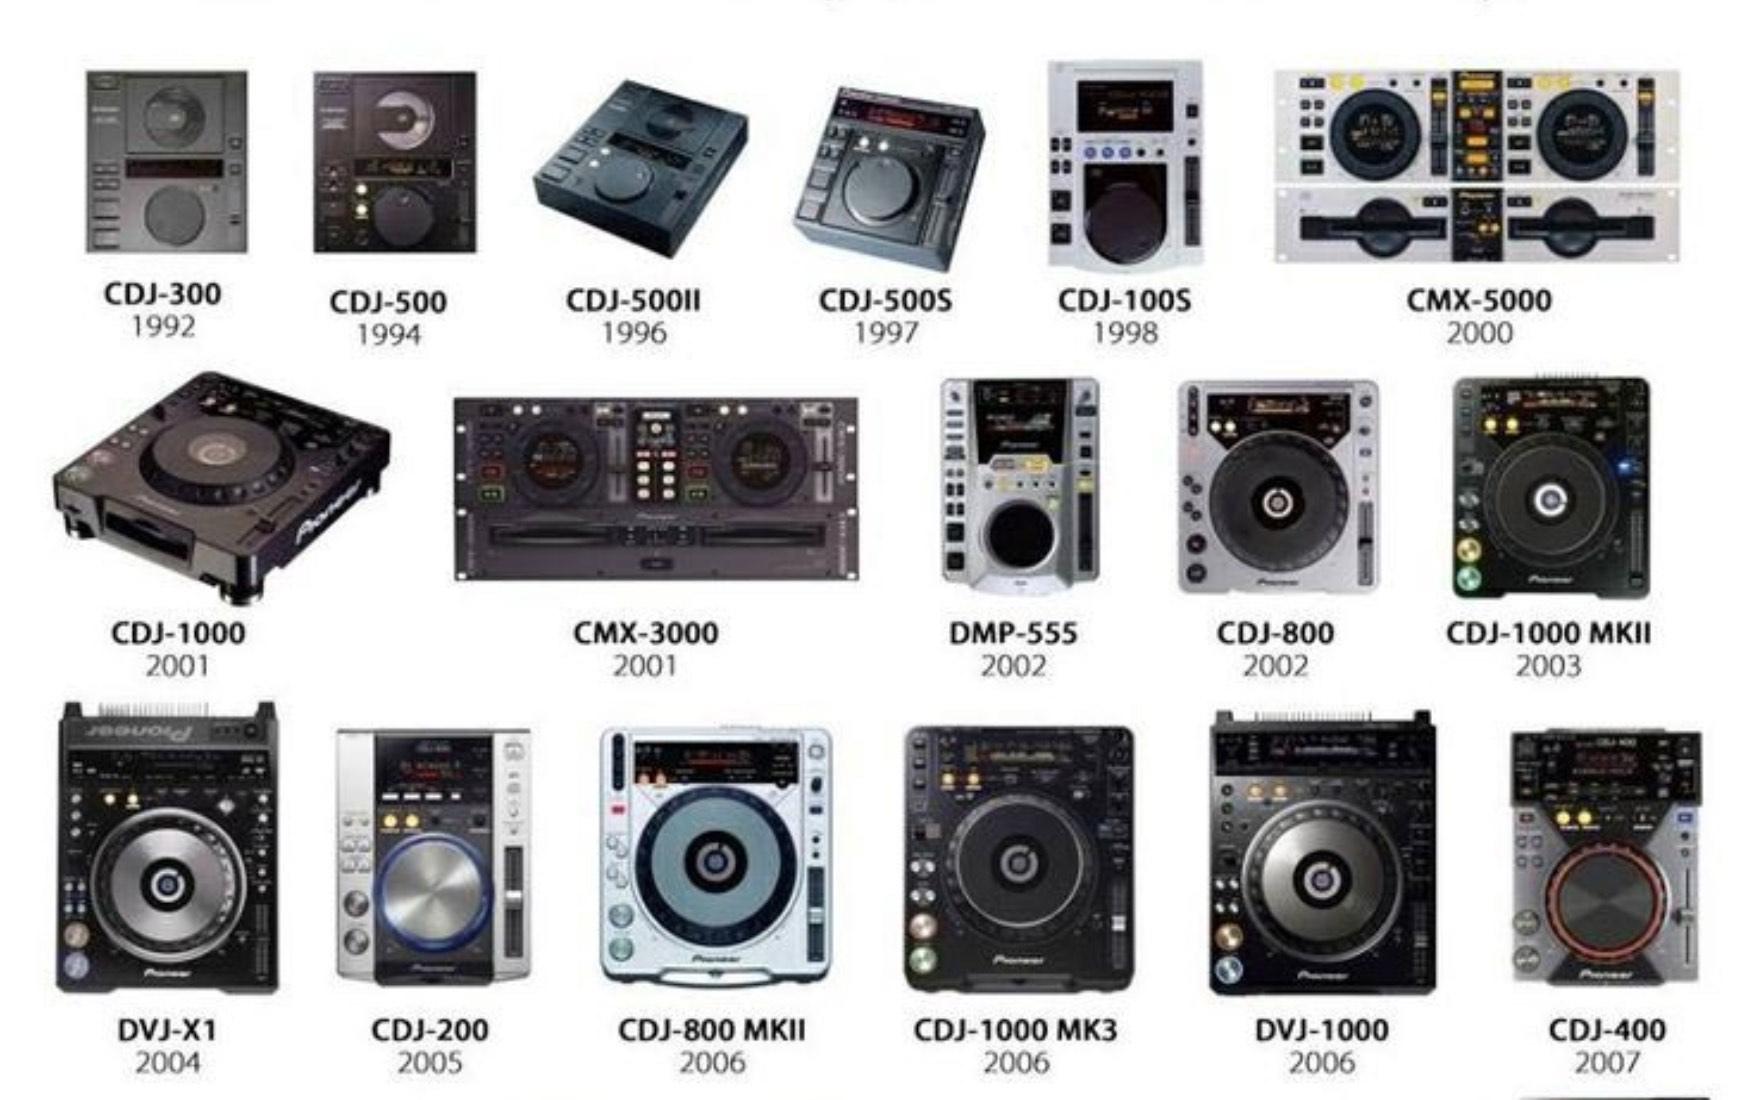 Equipamentos para DJ, algumas marcas e modelos... (2009) cdj, controlador, djban, equipamentos de dj, equipamentos para dj, fone de ouvido, mixer, numark, onde comprar, toca-discos, virtual dj, xponent